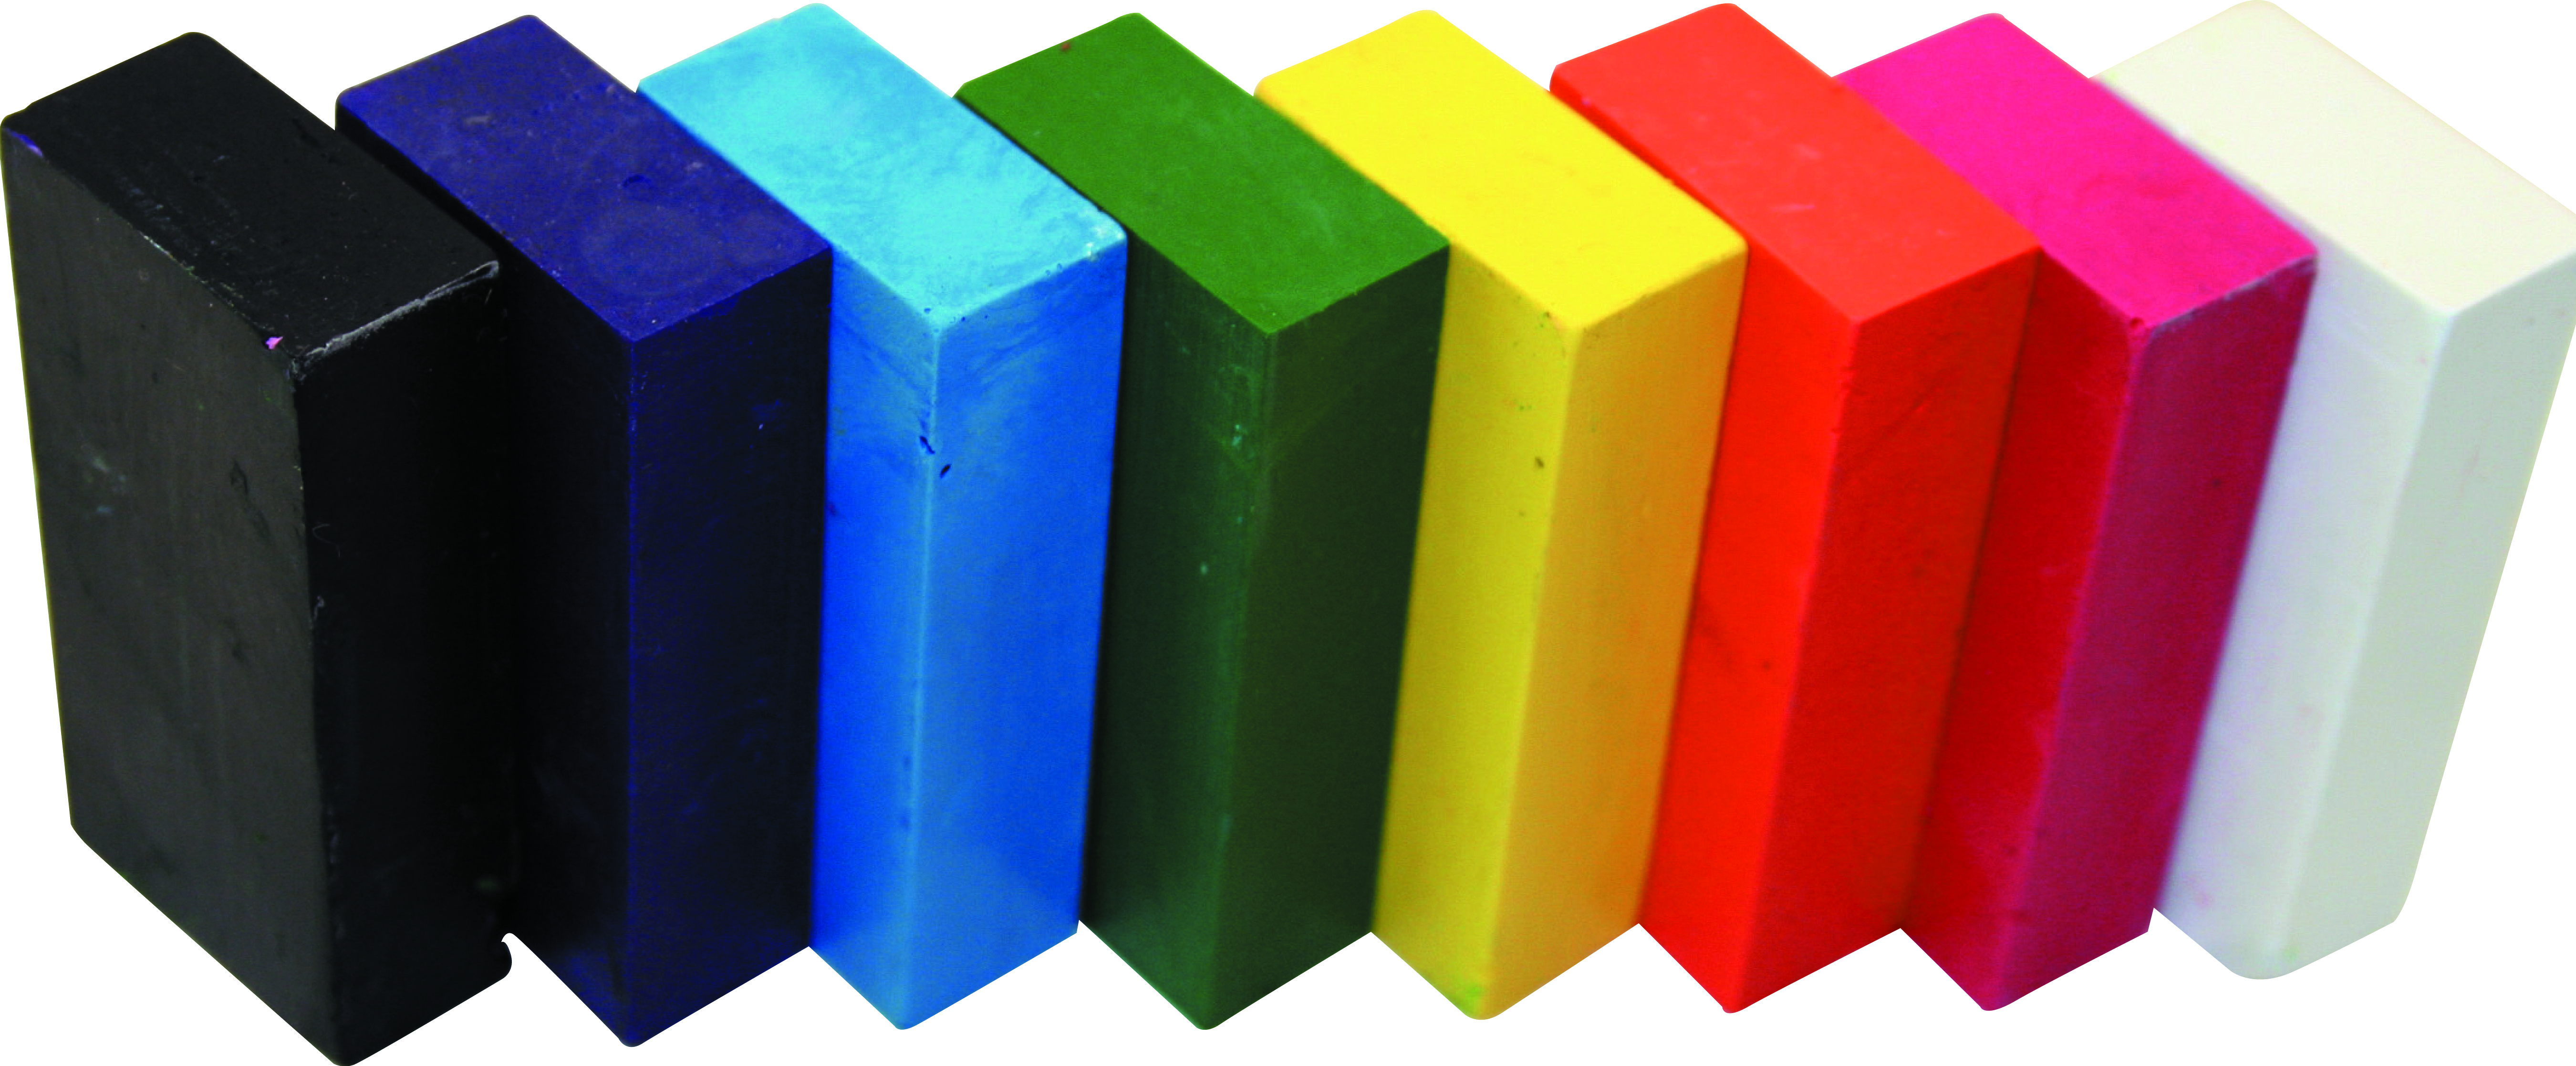 Kitpas - Crayon Block - 8 Colours